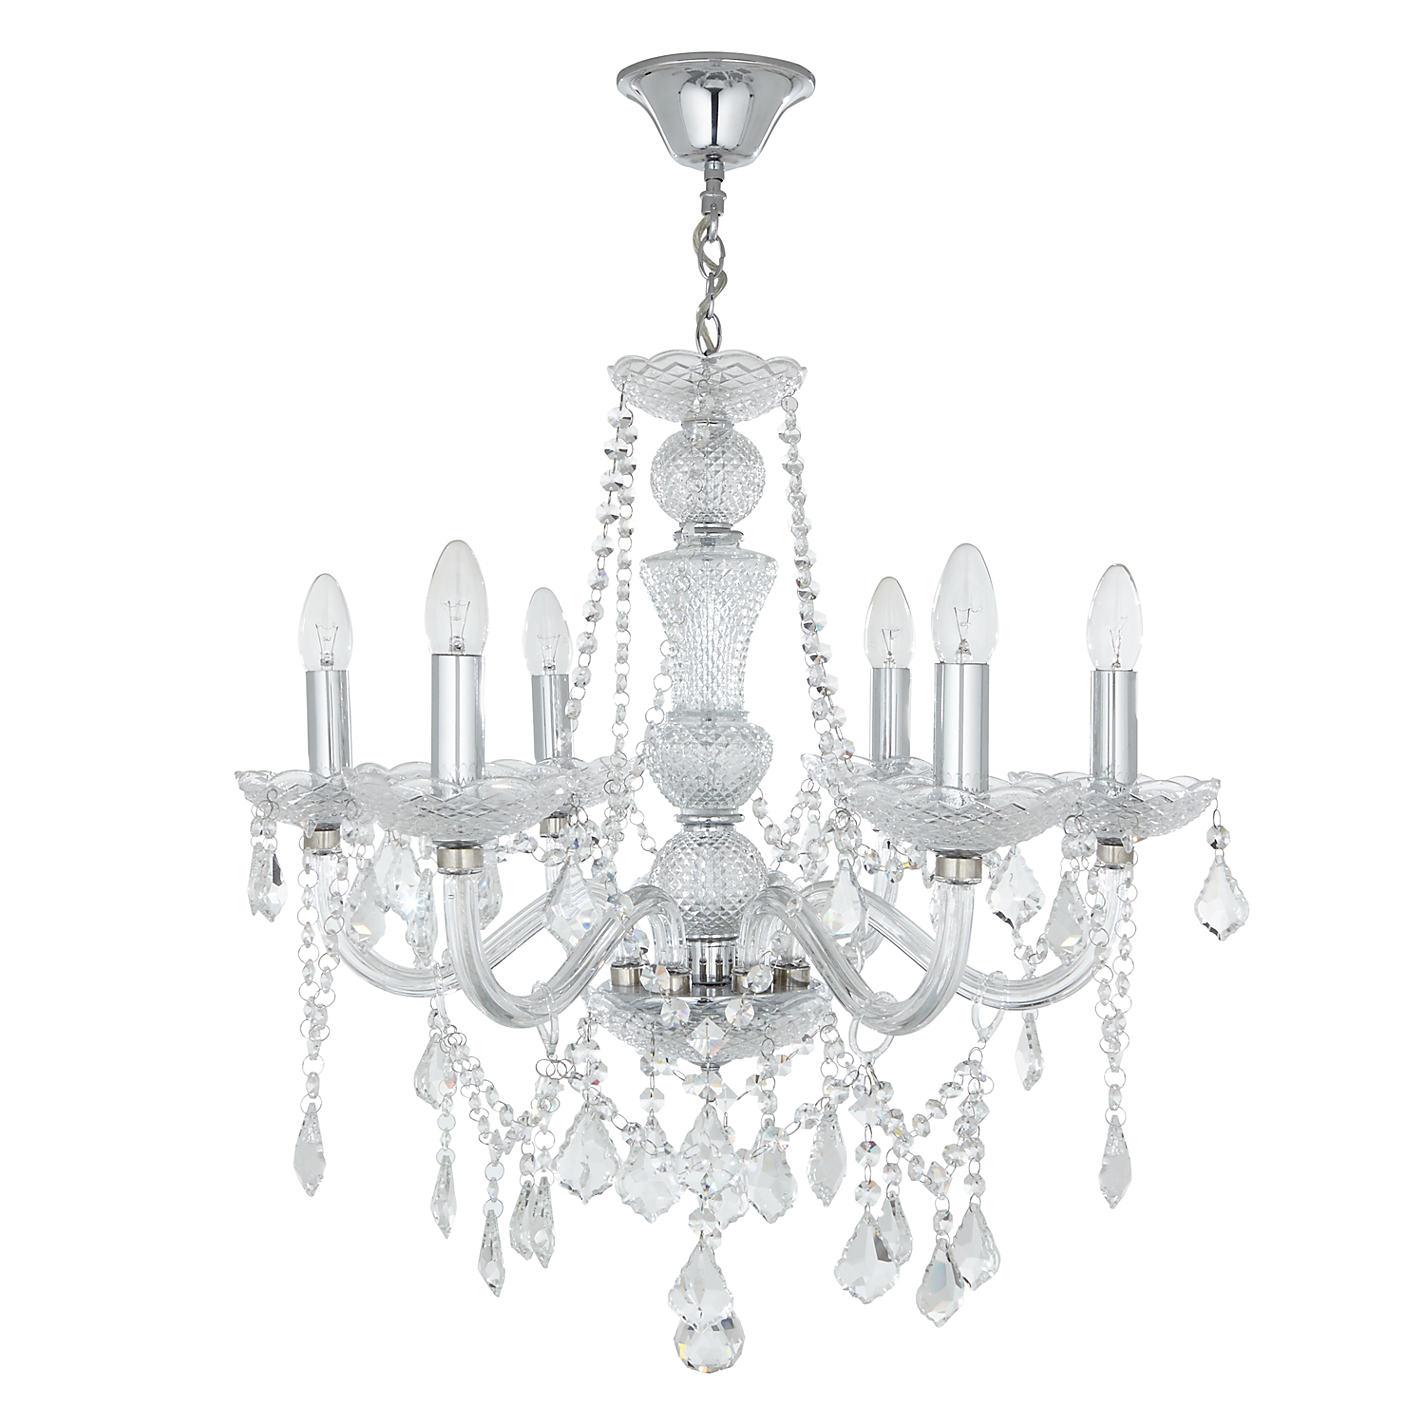 Buy john lewis bethany chandelier 6 arm john lewis buy john lewis bethany chandelier 6 arm online at johnlewis aloadofball Gallery